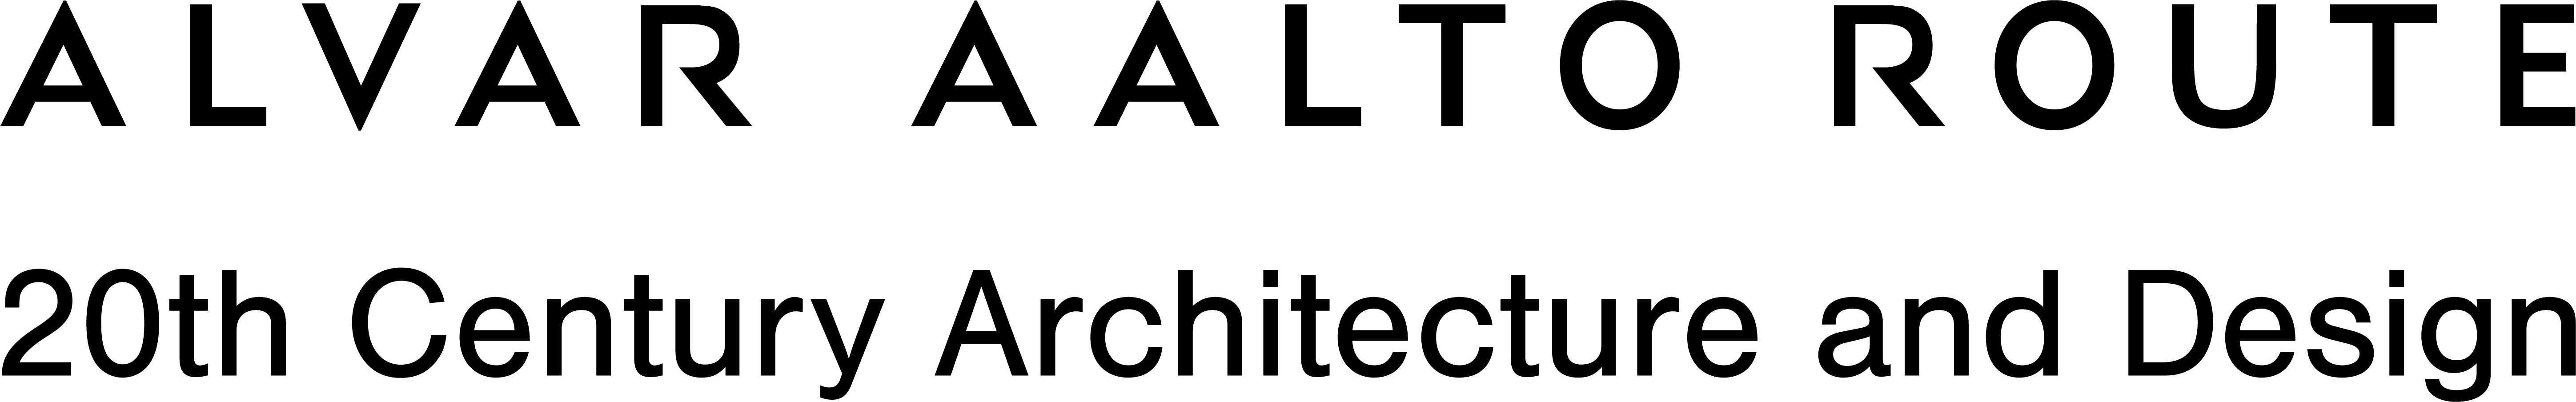 Alvar Aalto Route logo